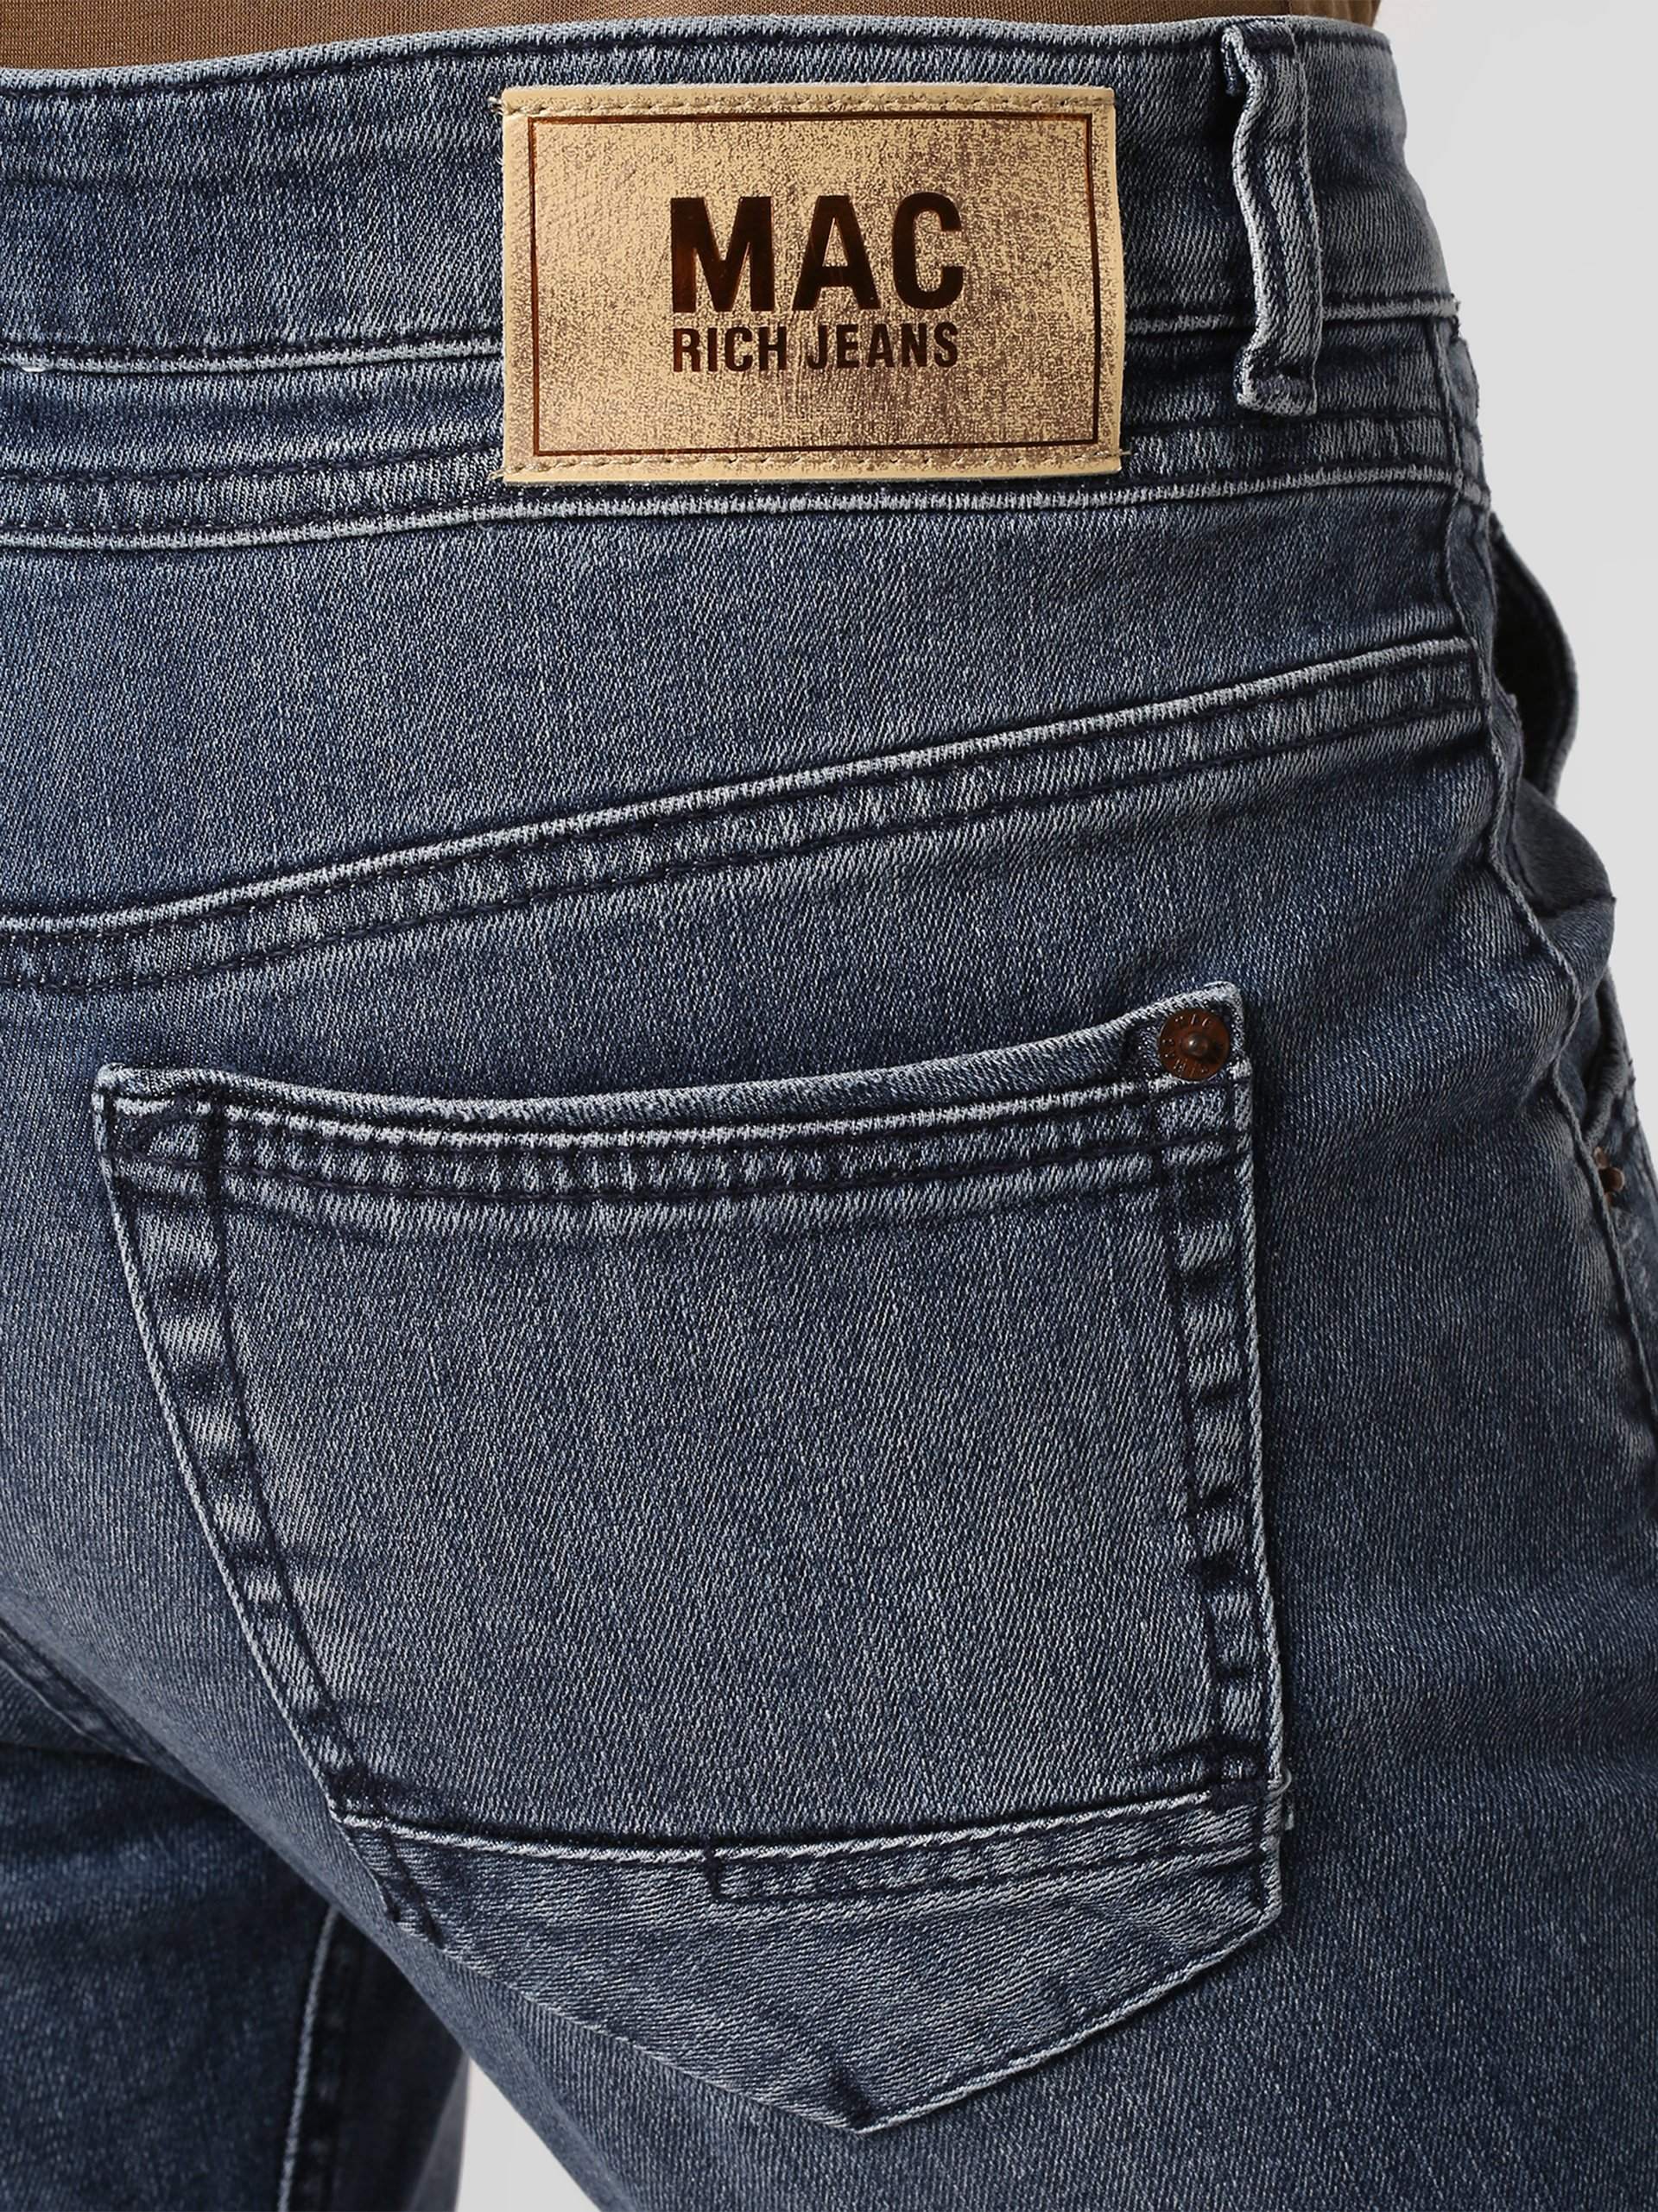 MAC Damen Jeans - Rich